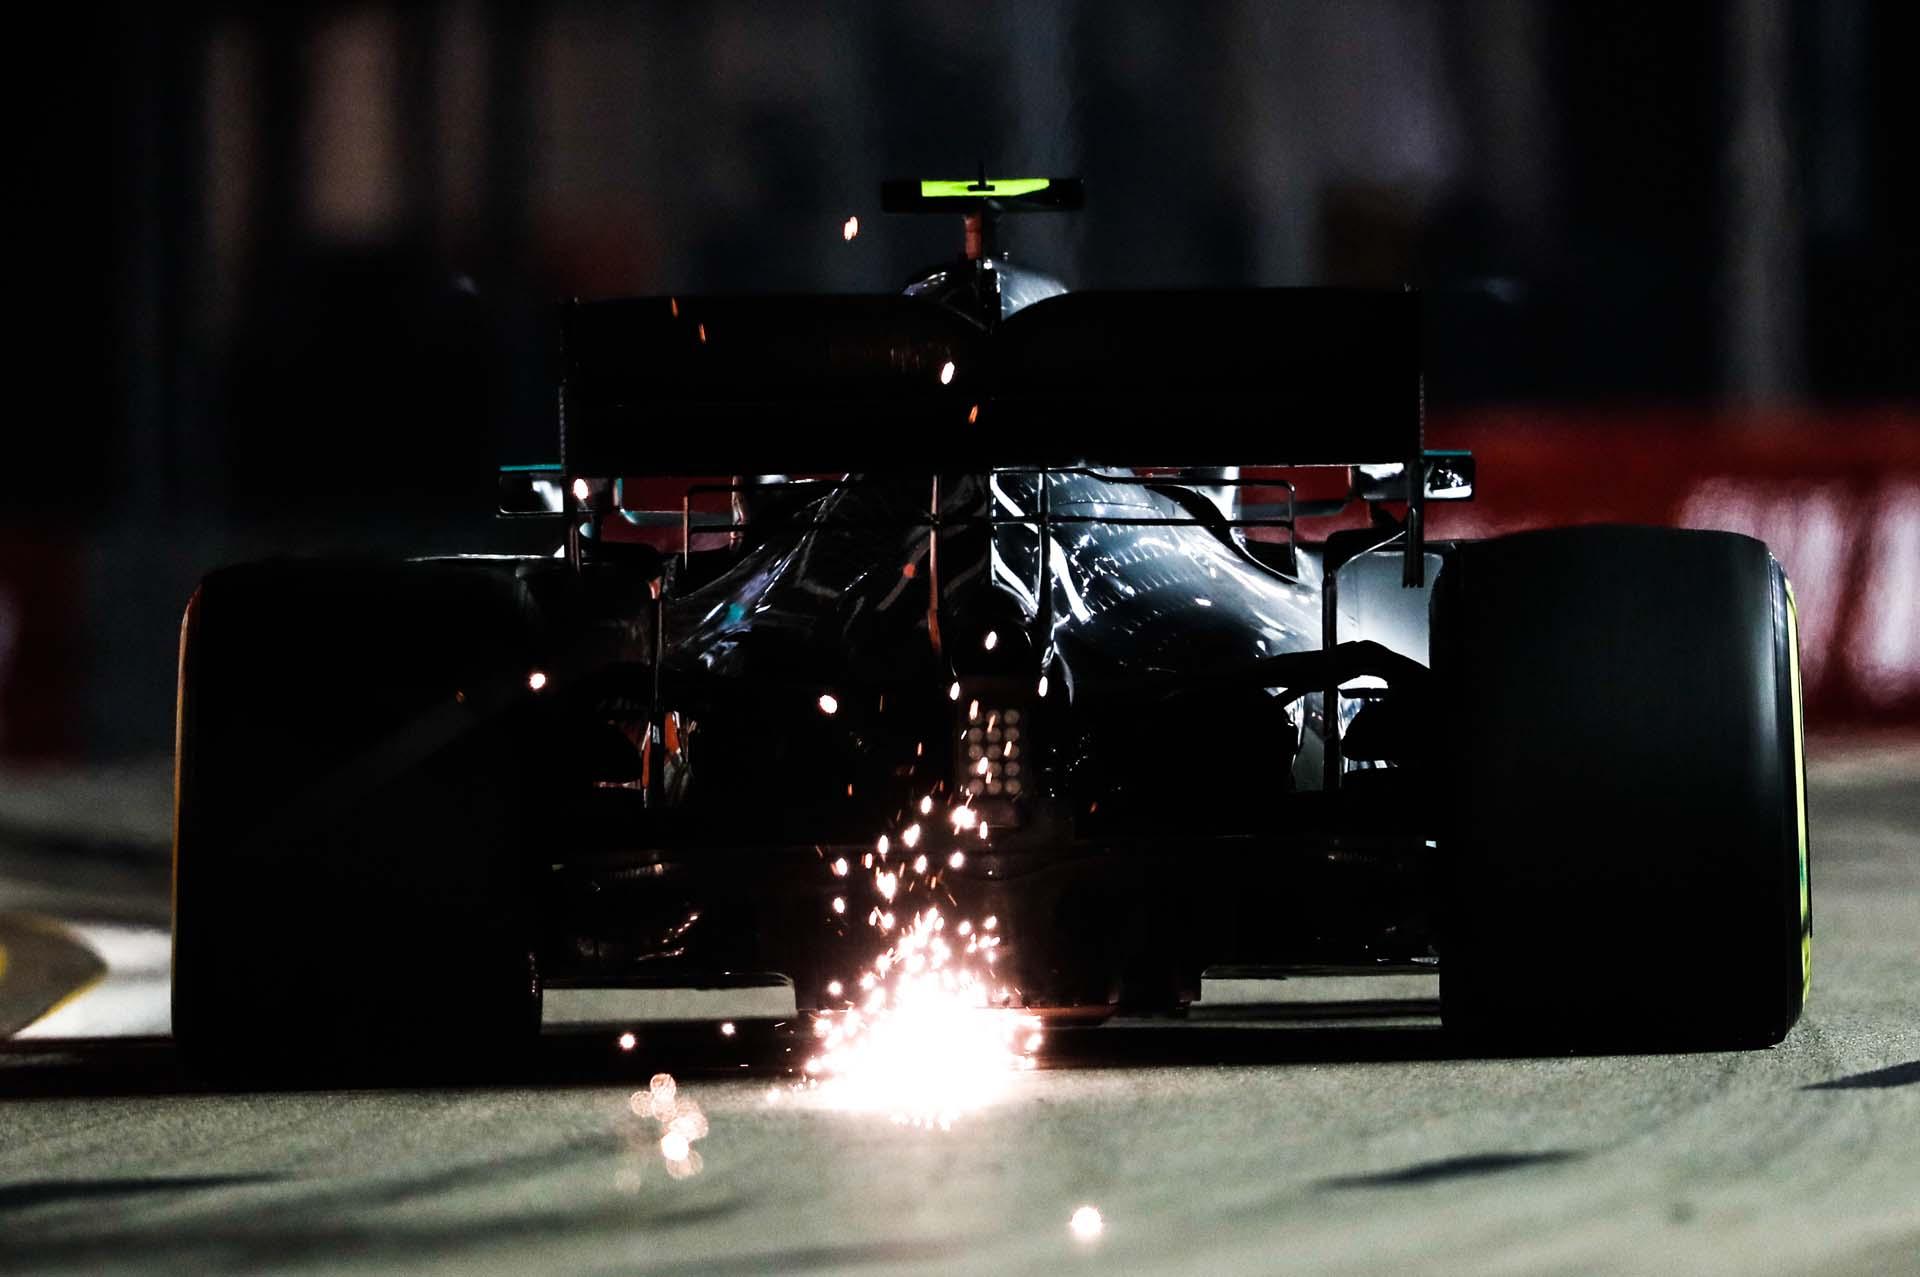 2019 Singapore Grand Prix, Friday - LAT Images